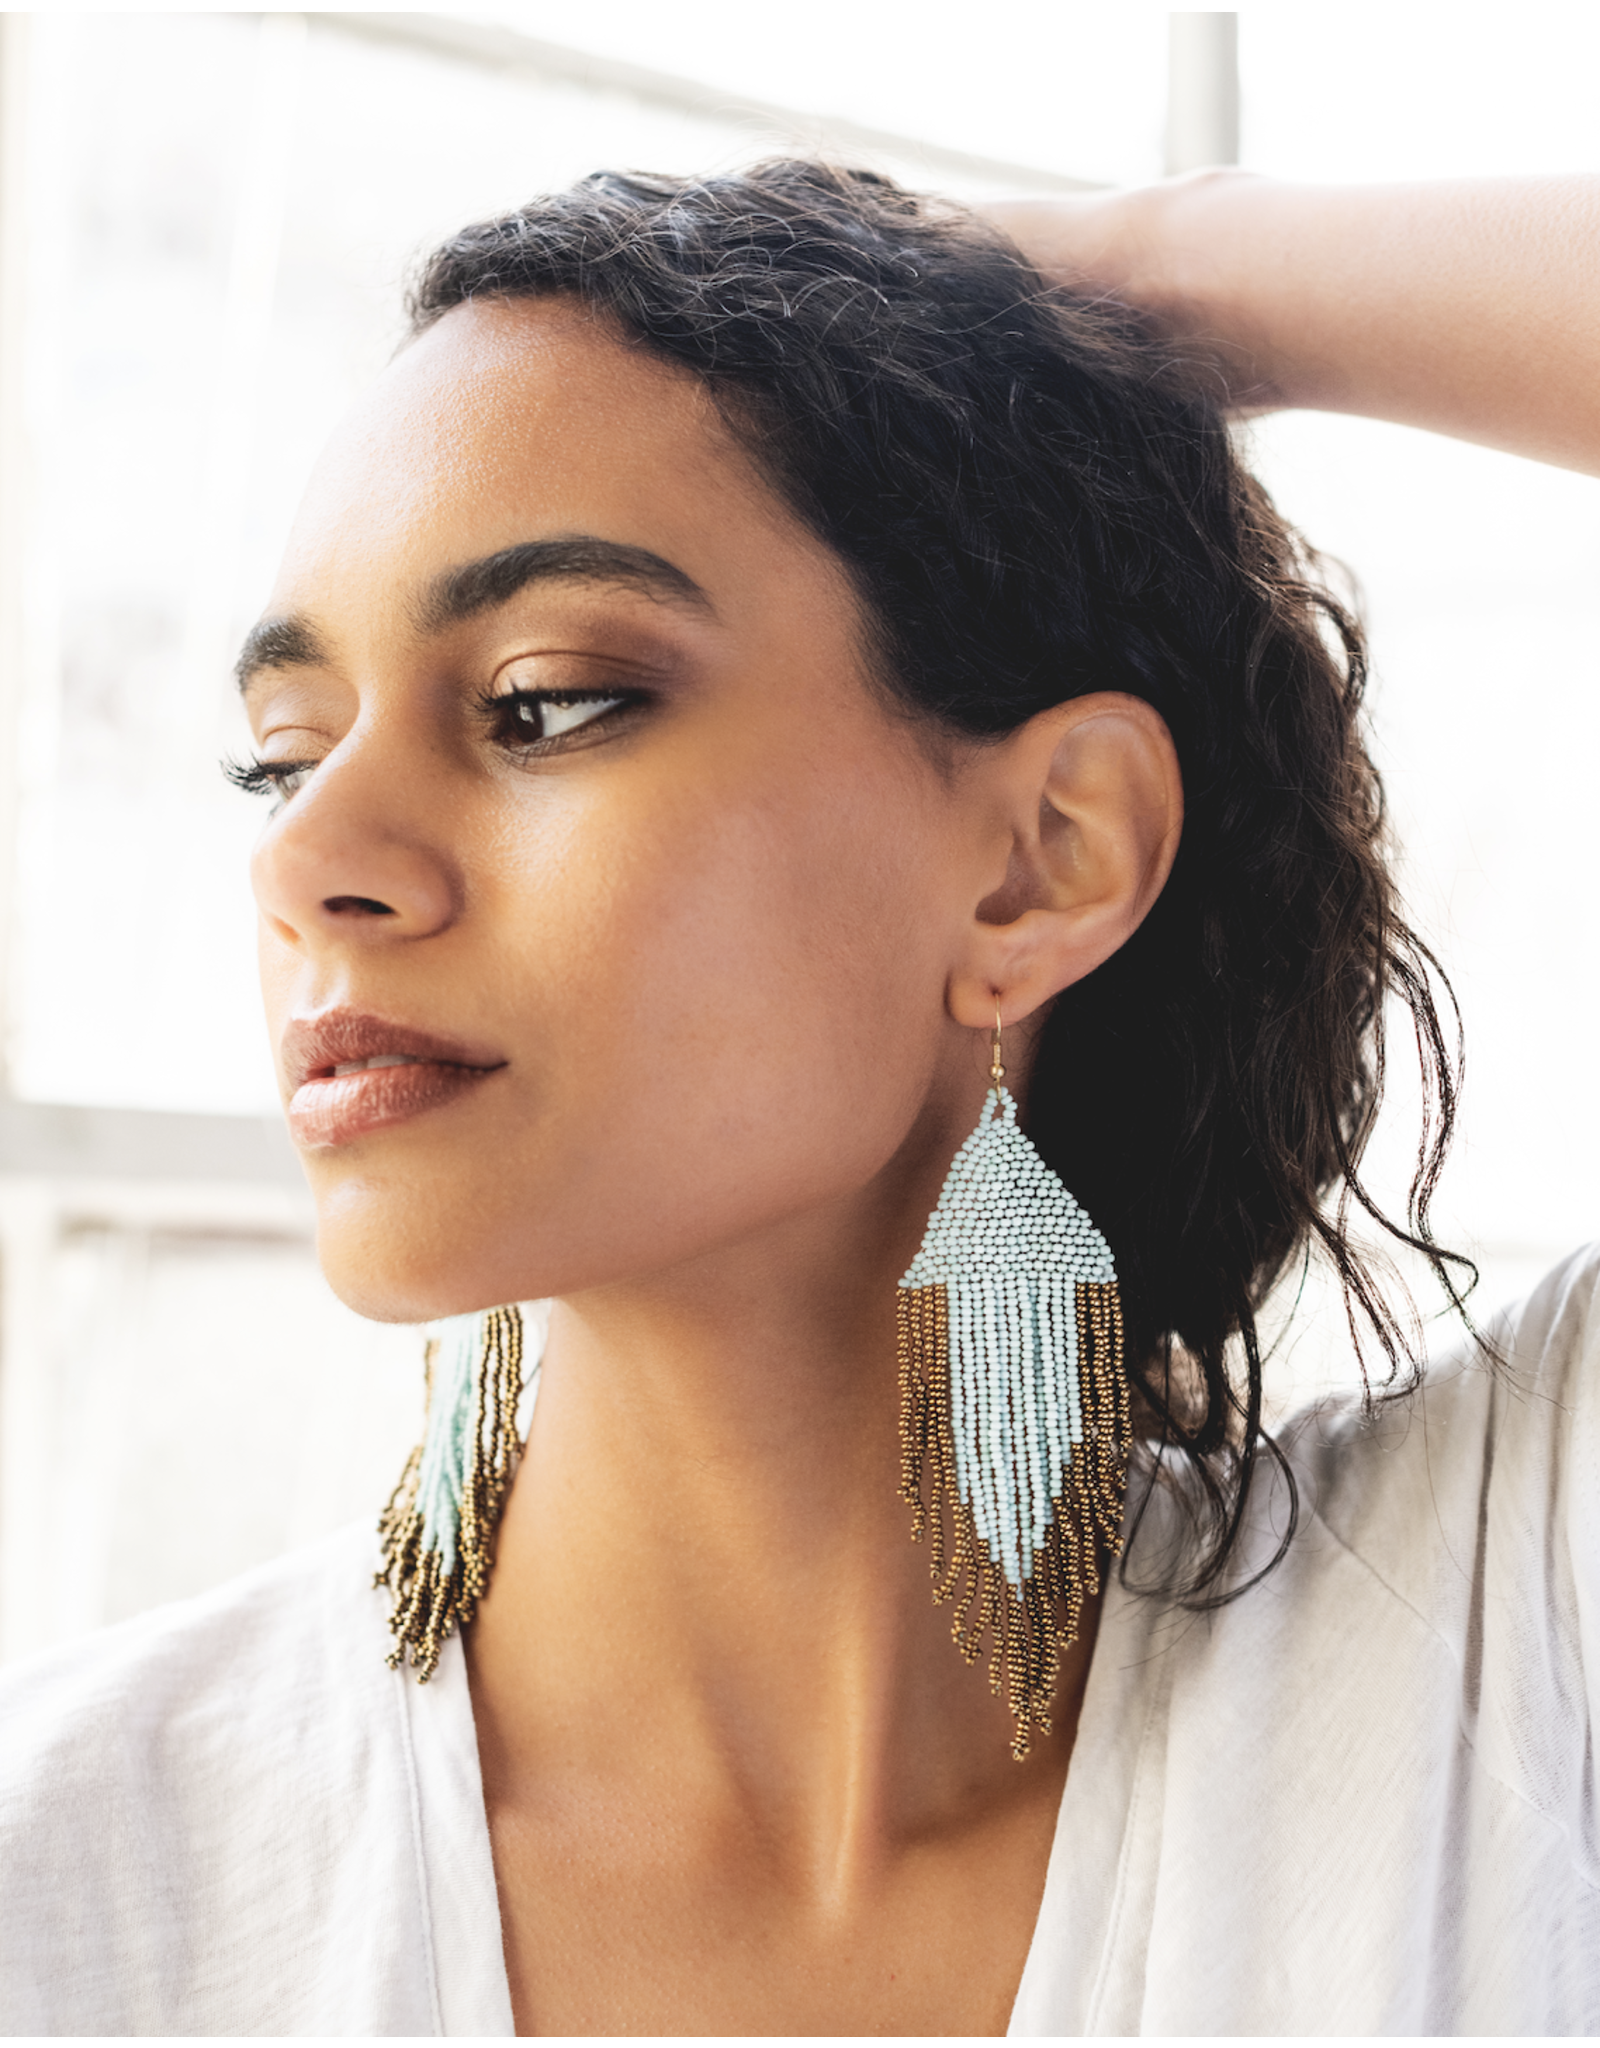 Blue and Gold Fringe Earrings